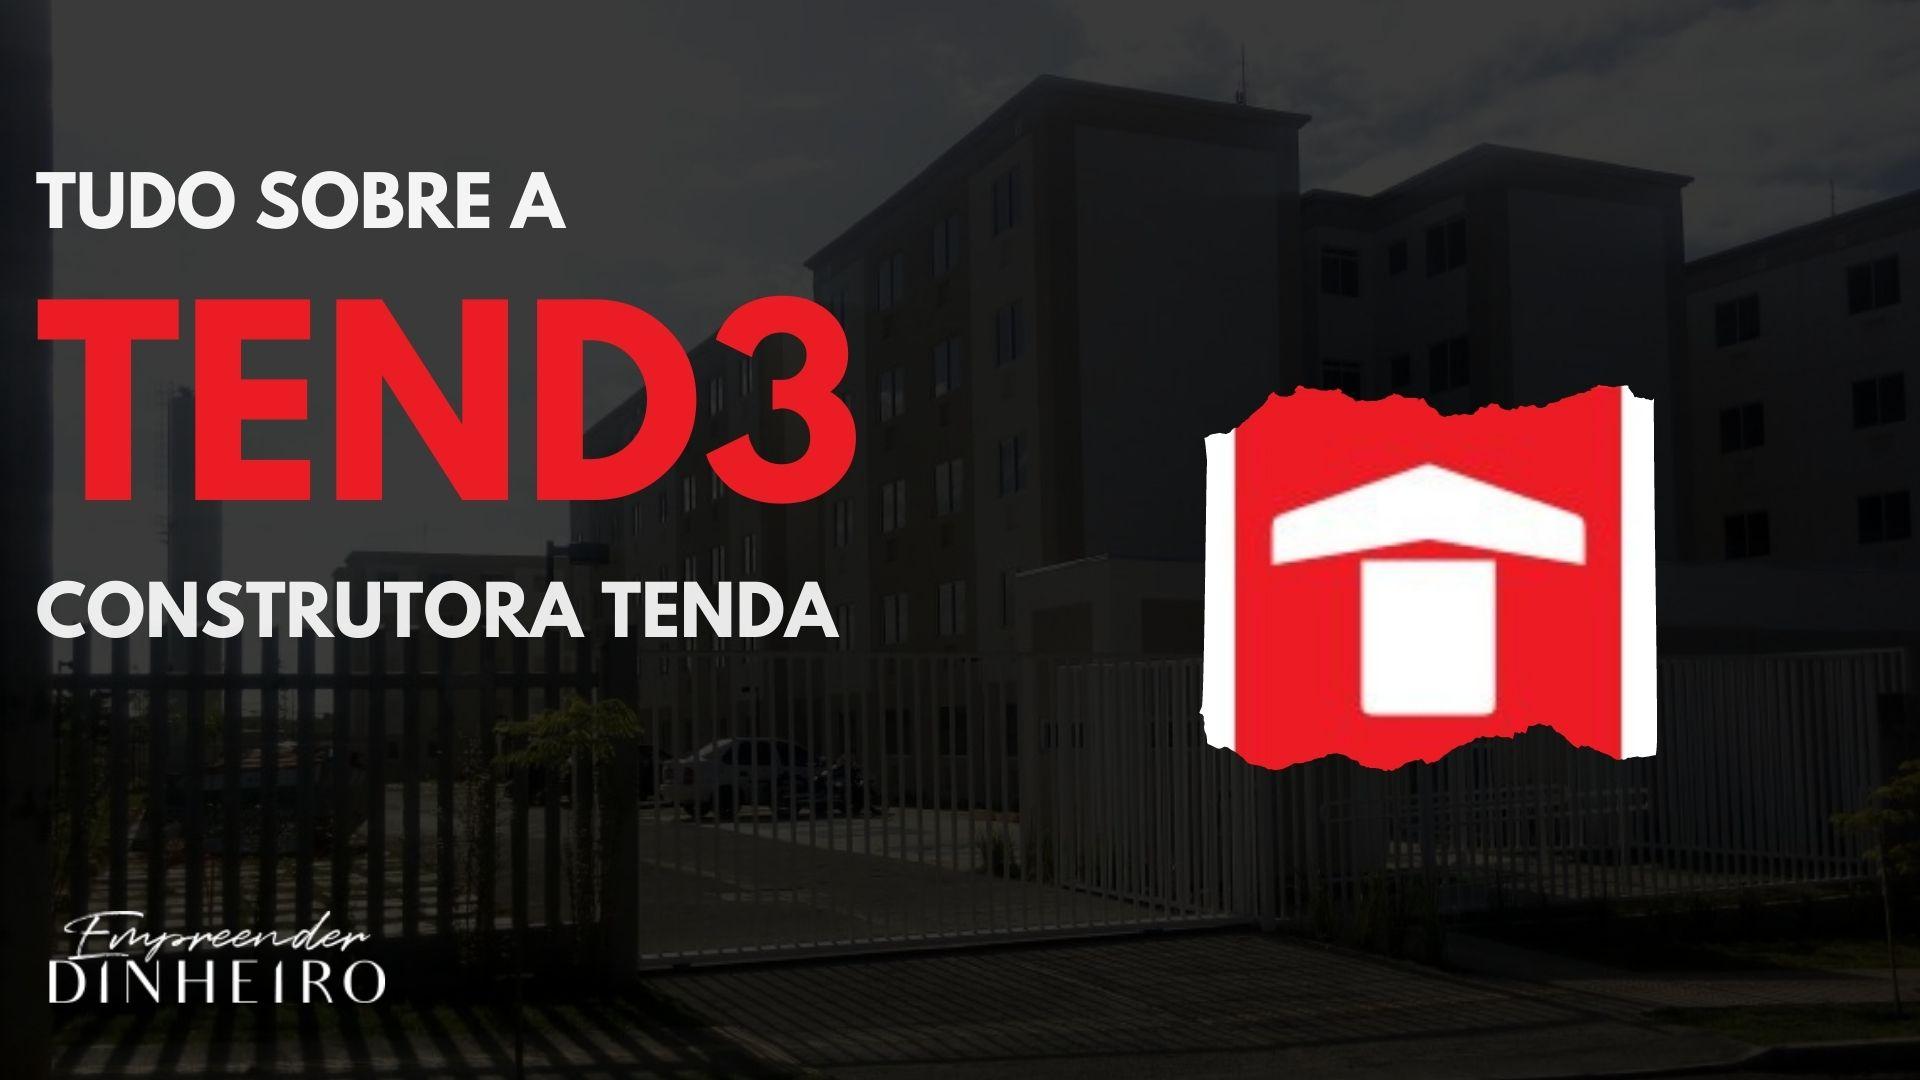 TEND3